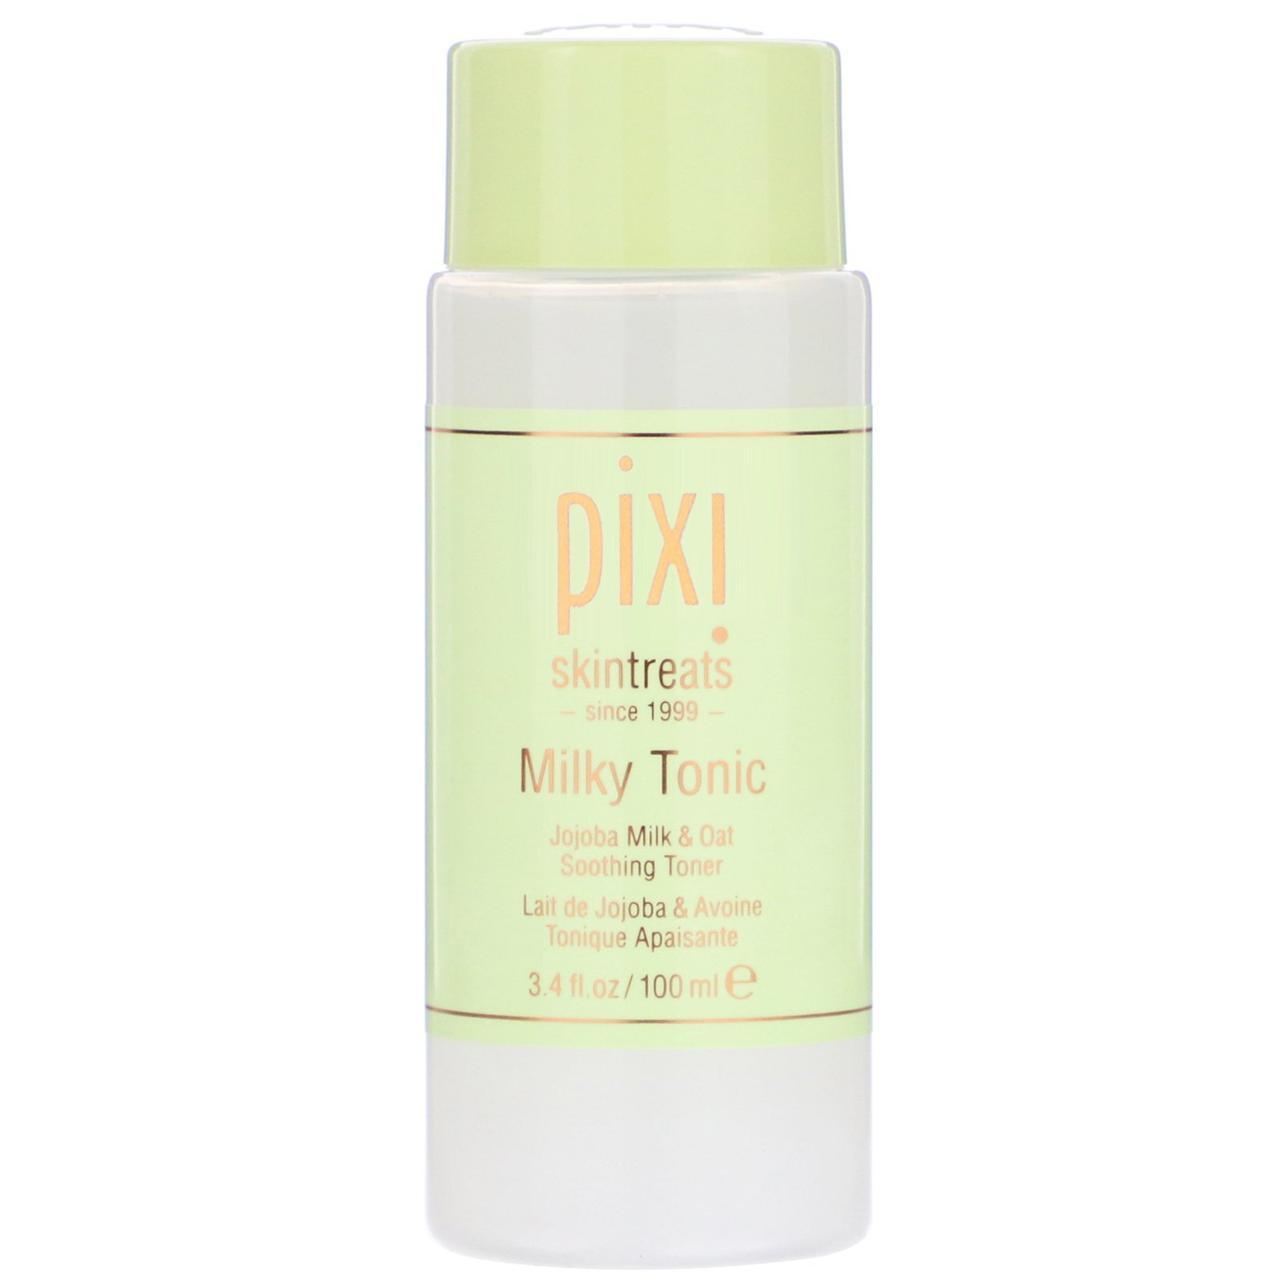 Молочный тоник Pixi Beauty, Skintreats, Milky Tonic, Soothing Toner, 3.4 fl oz (100 ml)